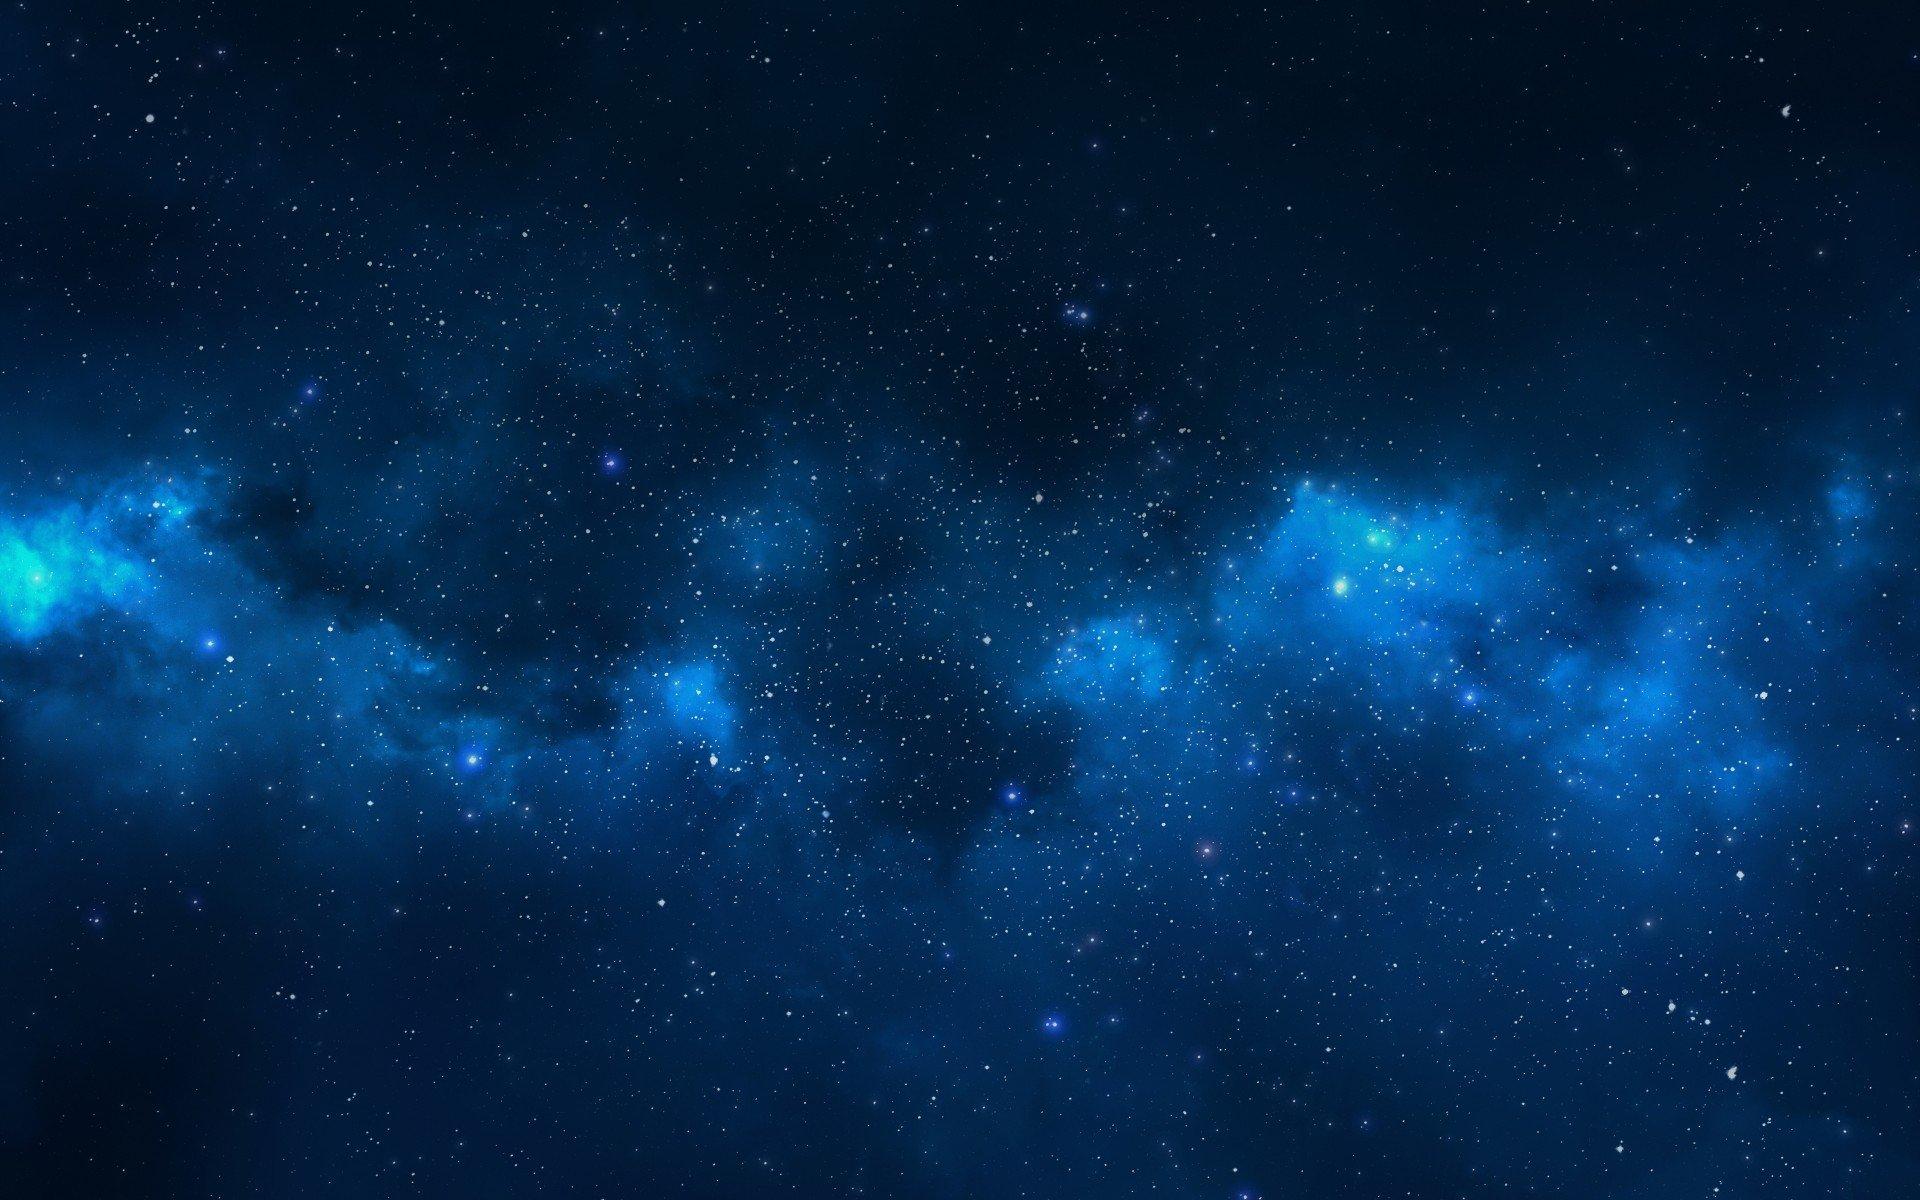 38] HD Wallpaper Night Sky on WallpaperSafari